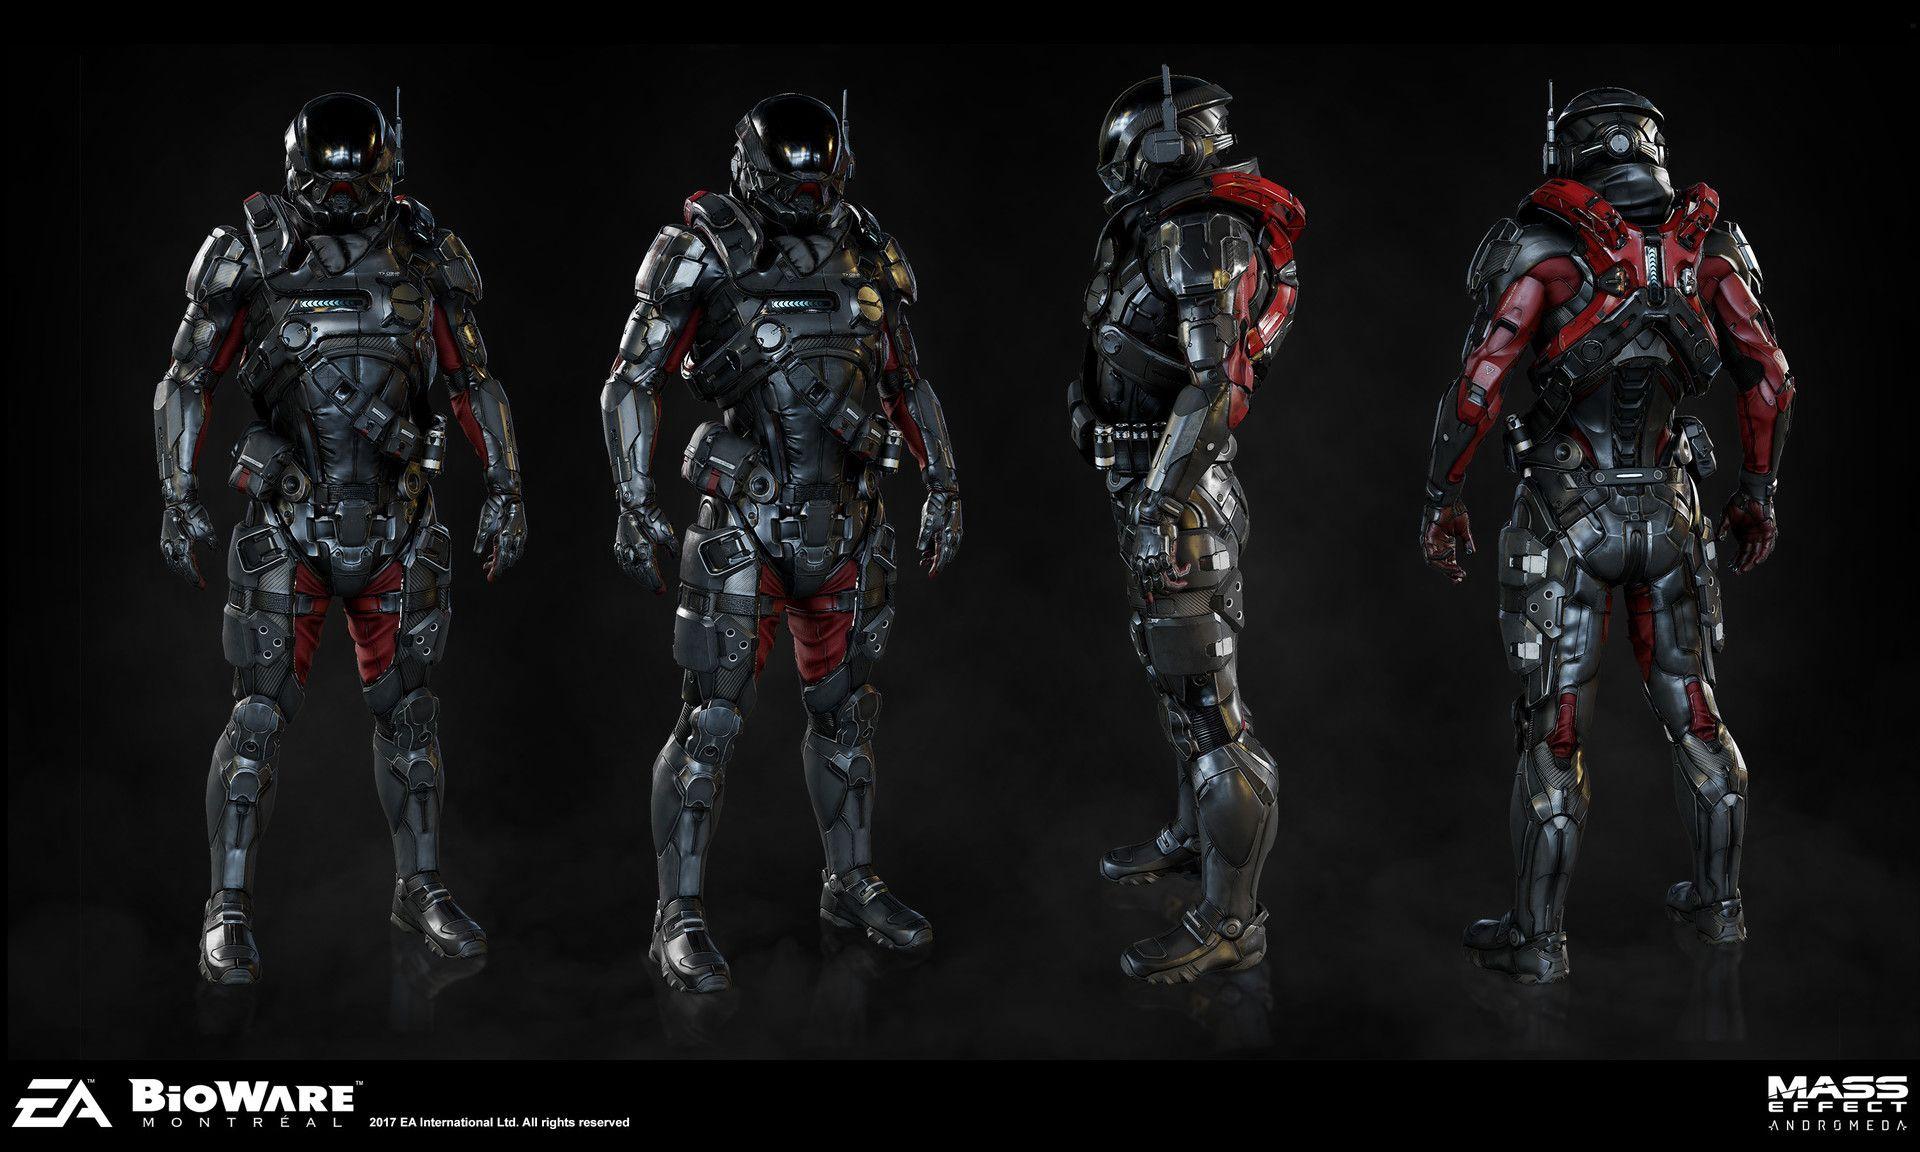 pathfinder armor set for mea art director joel macmillan concept